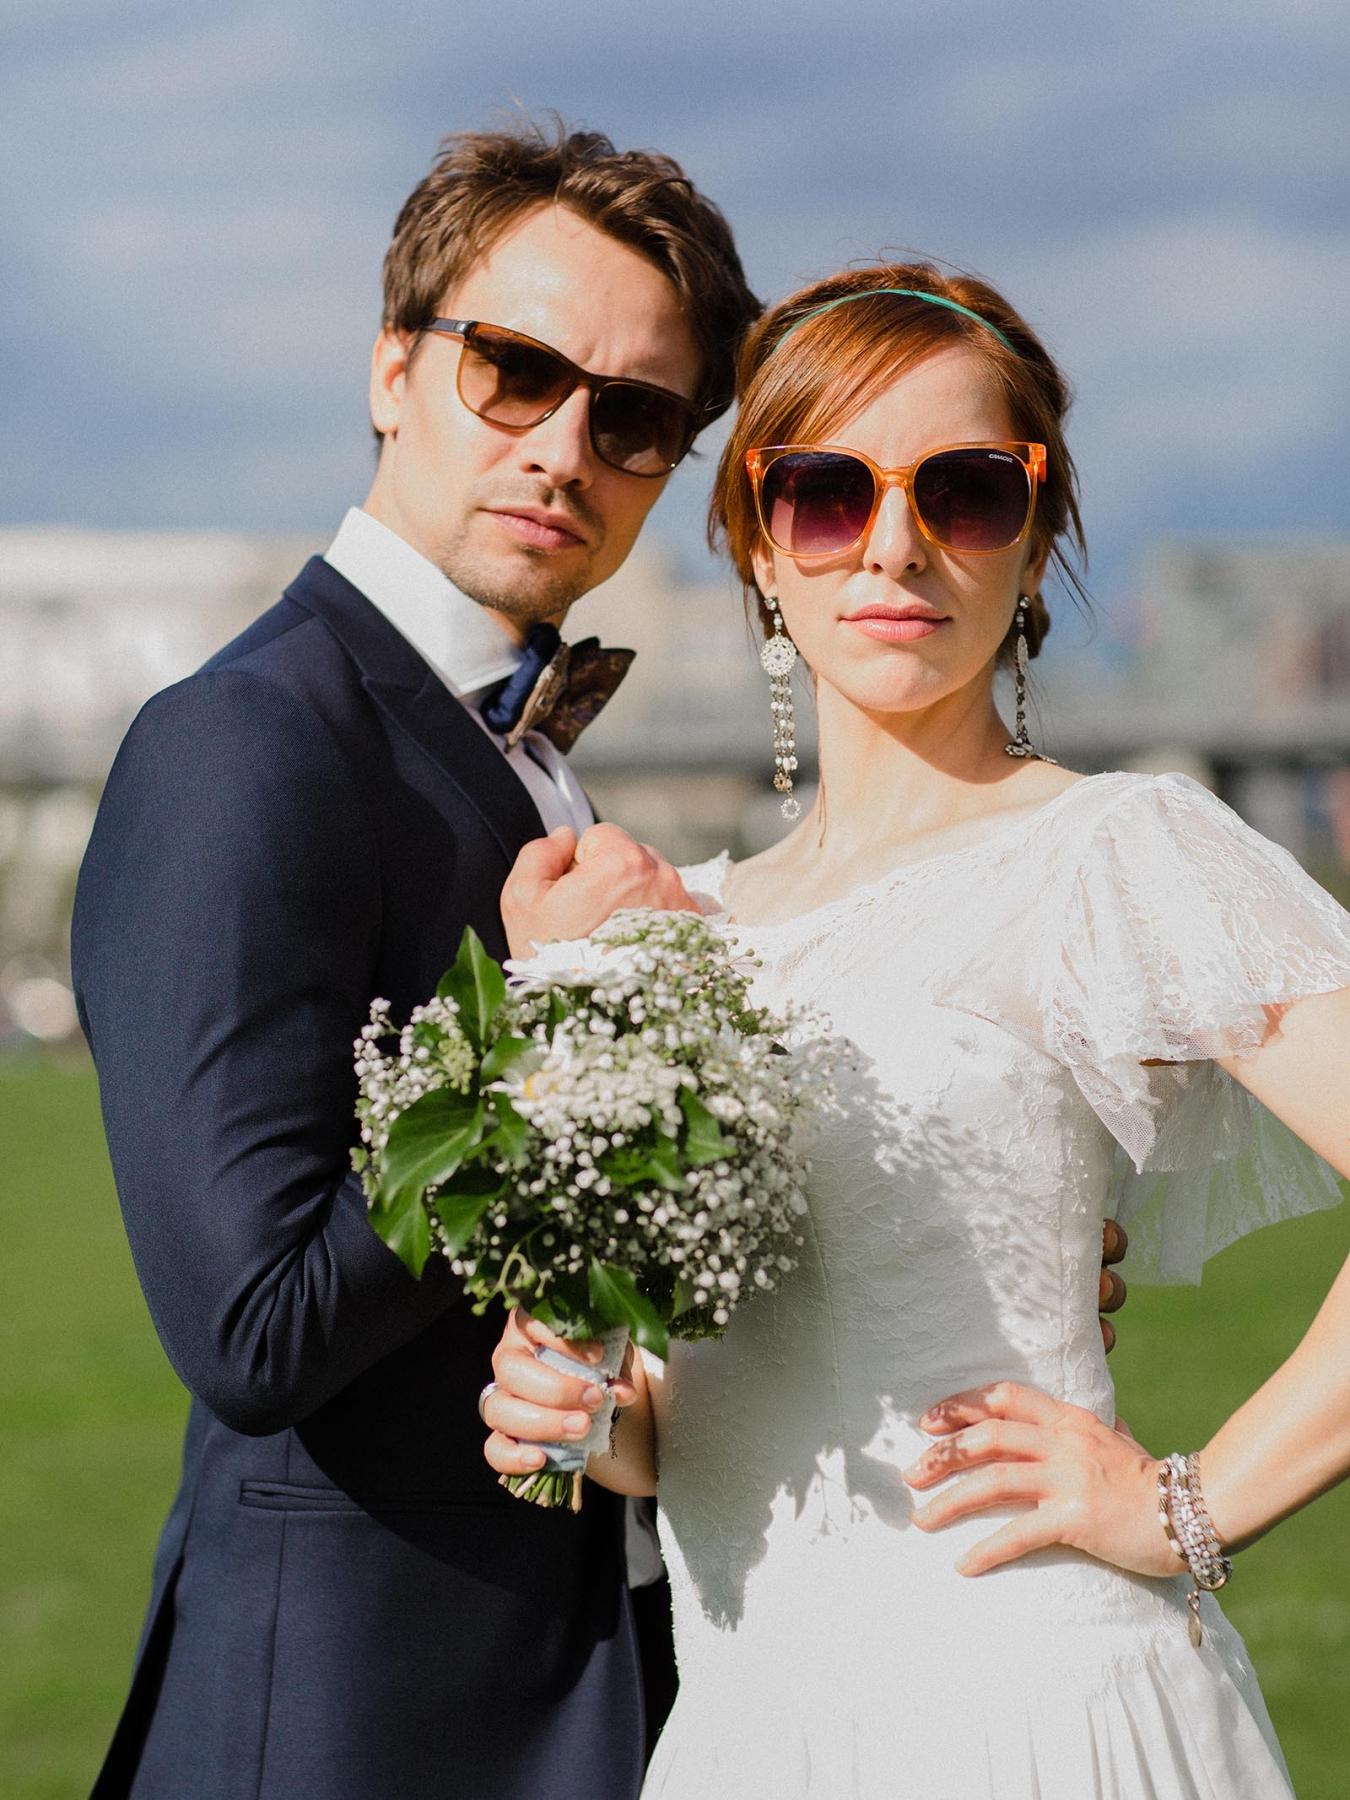 Hochzeitsfotograf-Berlin-Causalux-Felix&Marlen